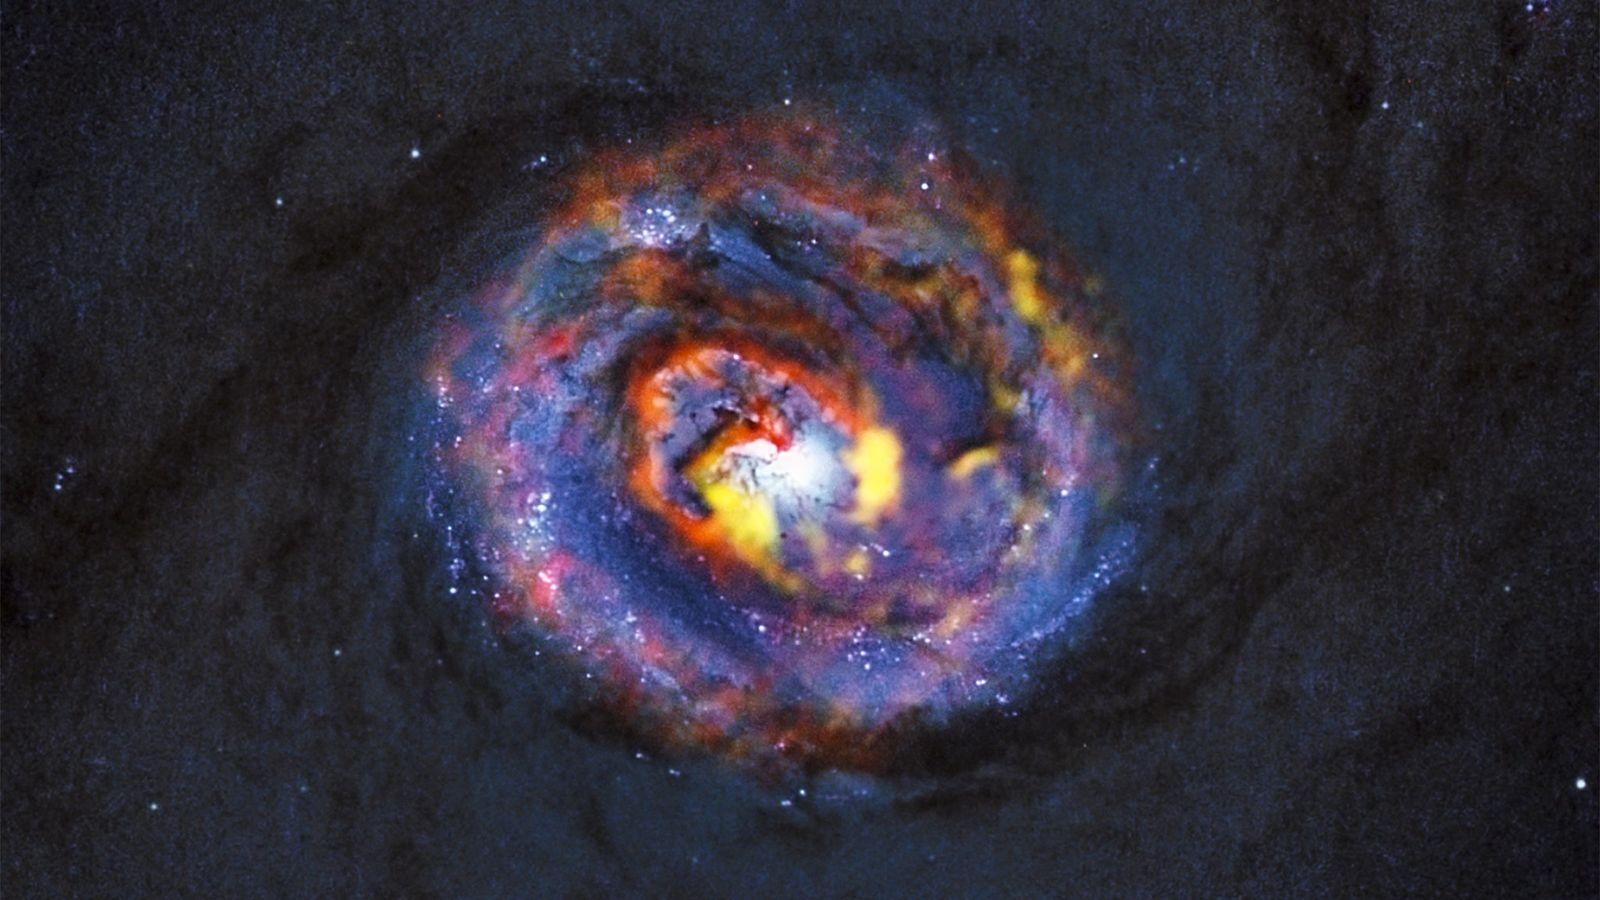 Arriba, una sorprendente espiral observada en la galaxia NGC 1433 (una galaxia activa cercana a la ...